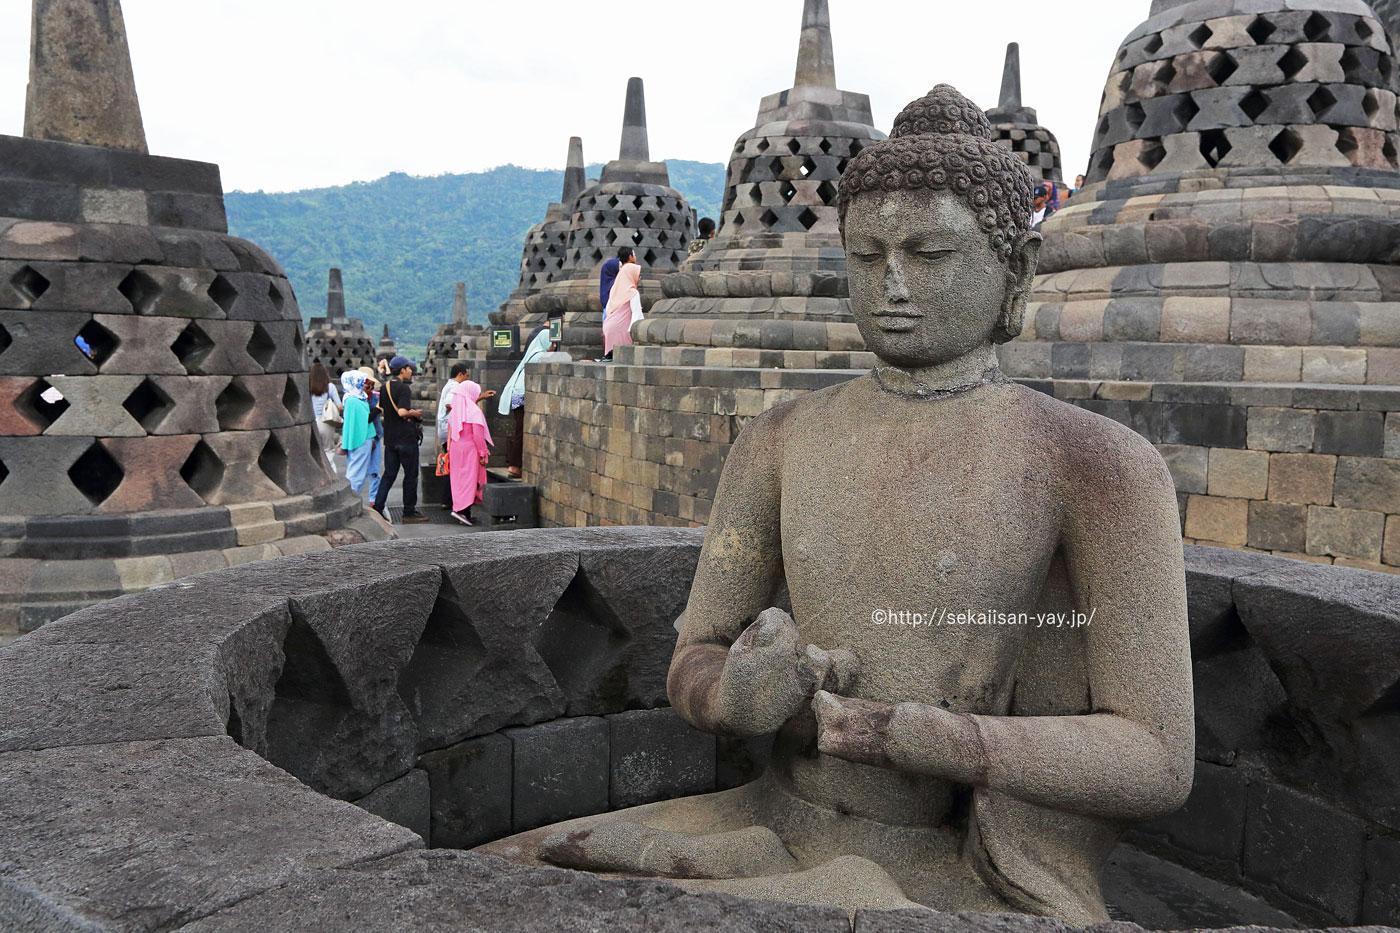 NHKラジオ第1マイあさ!11月はインドネシアの世界遺産「ボロブドゥール寺院遺跡群」をご紹介